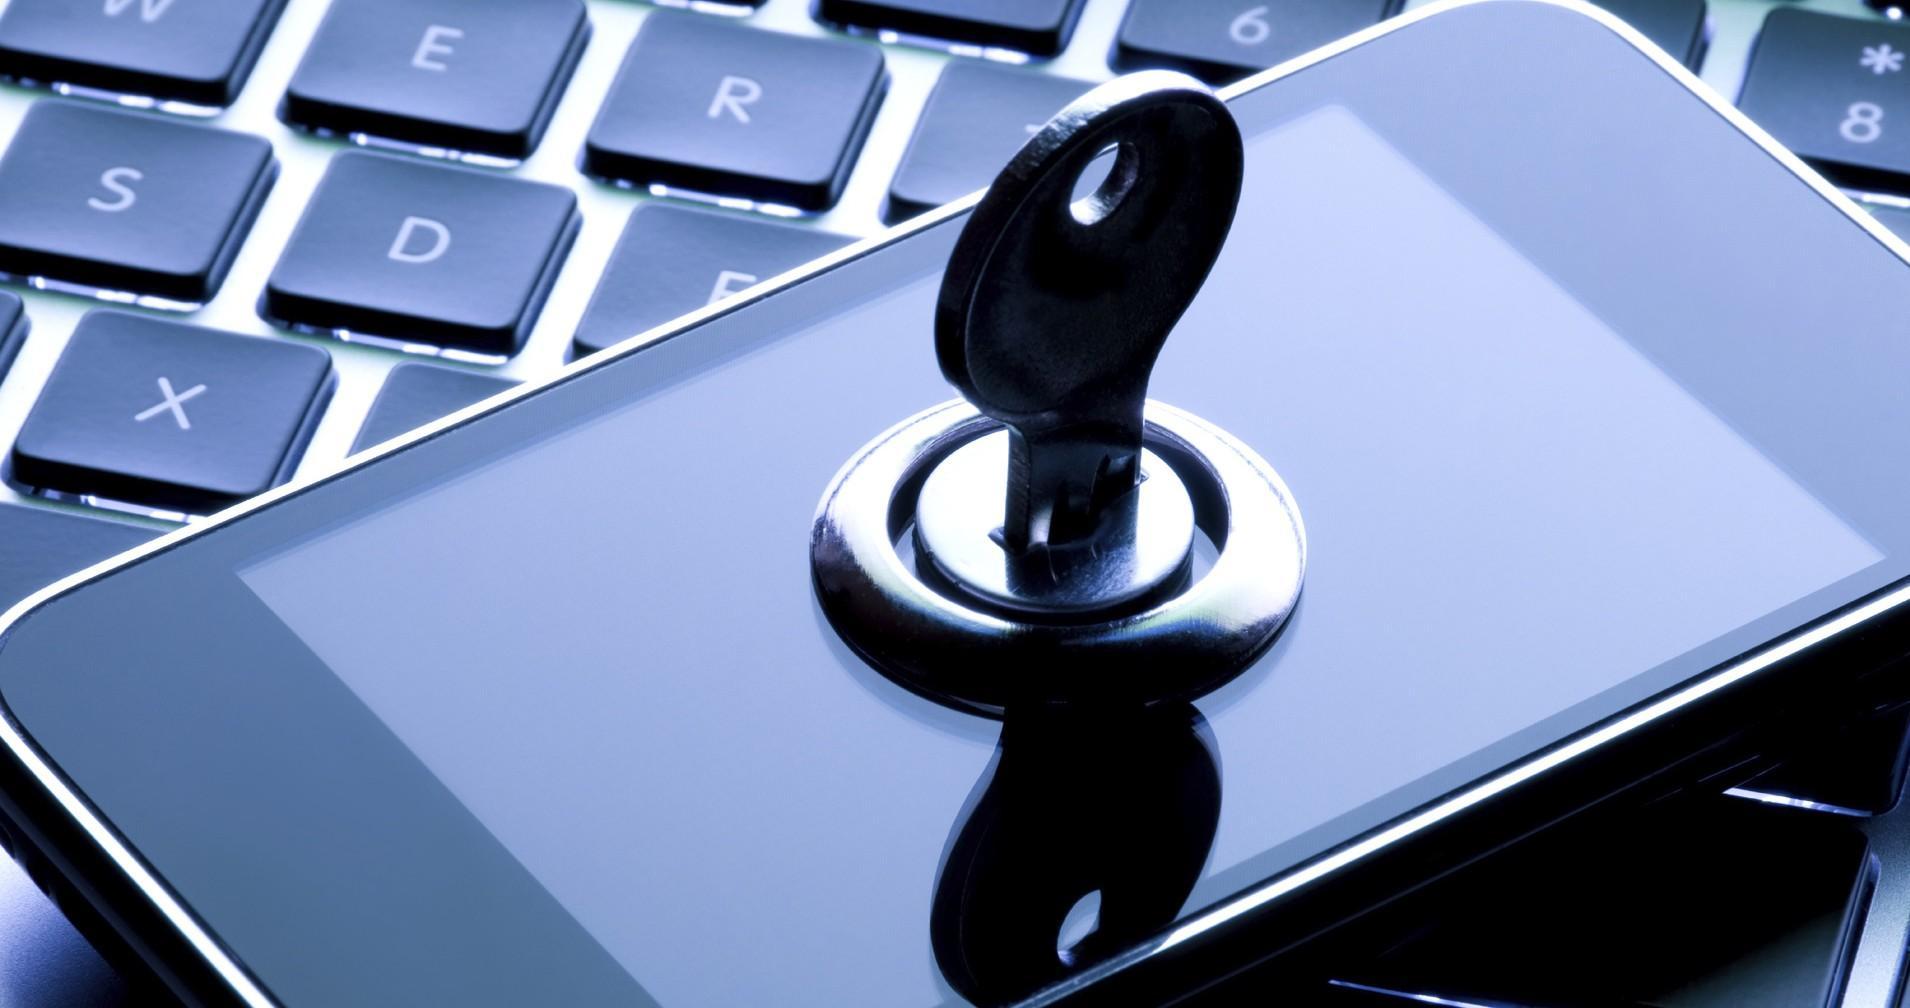 Как защитить смартфон от слежки